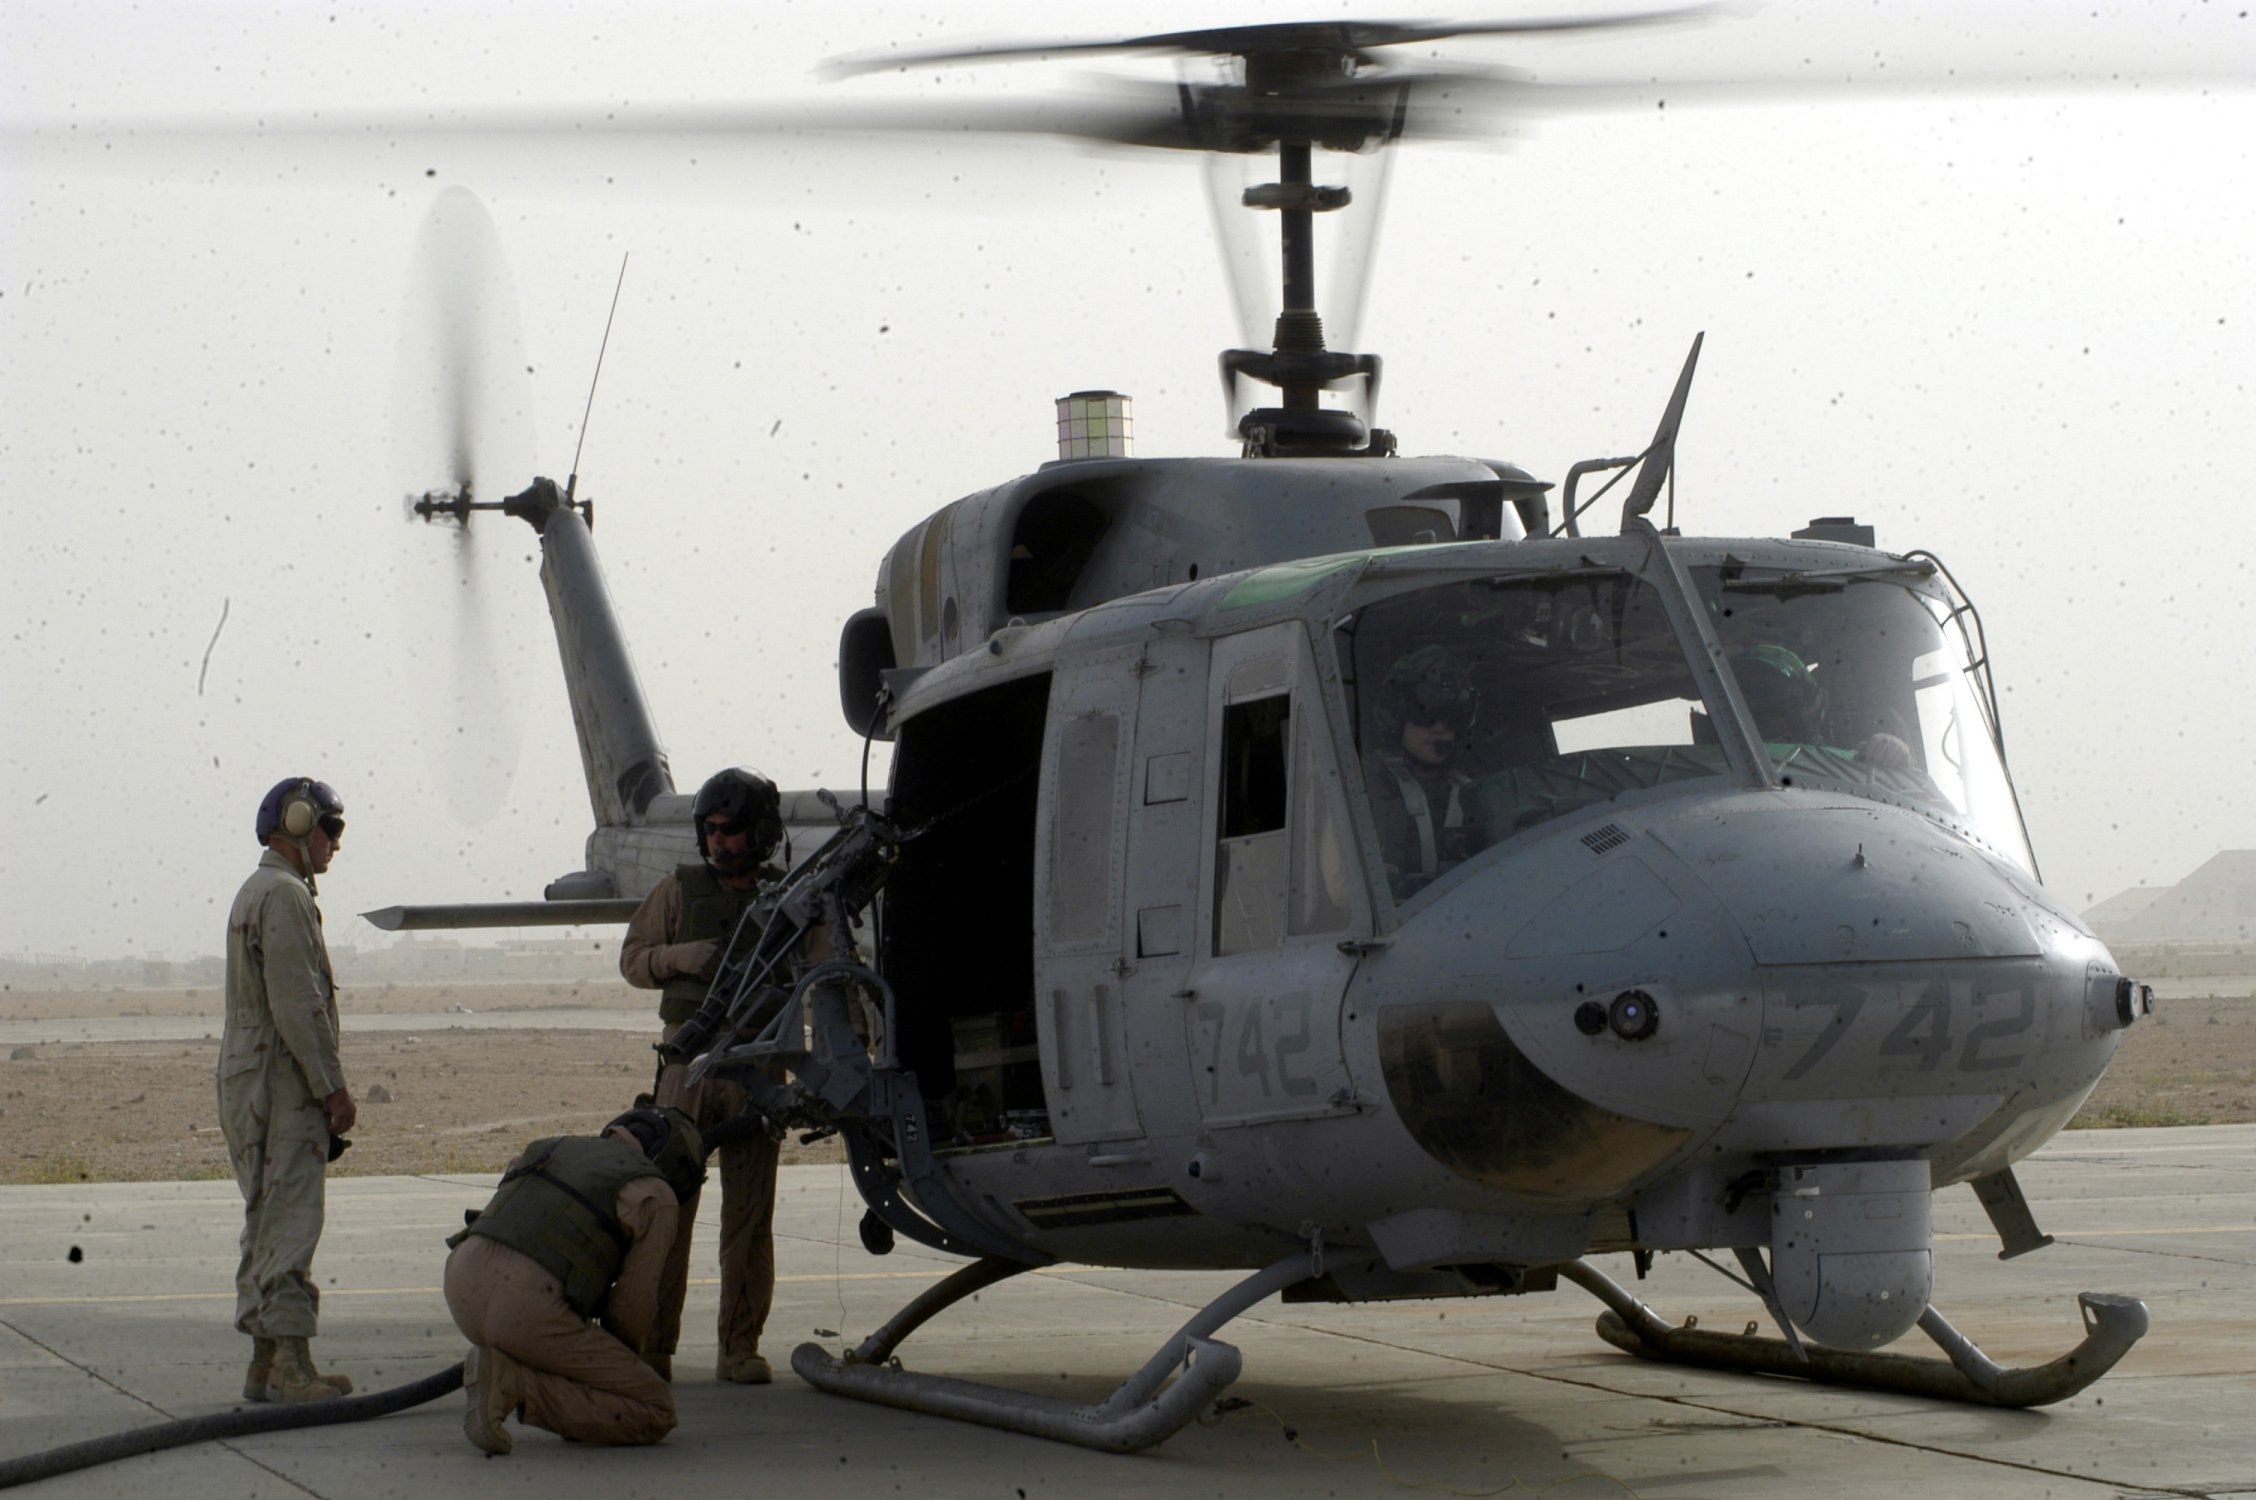 Vietnam huey engine vietnam free engine image for user for Porte helicoptere